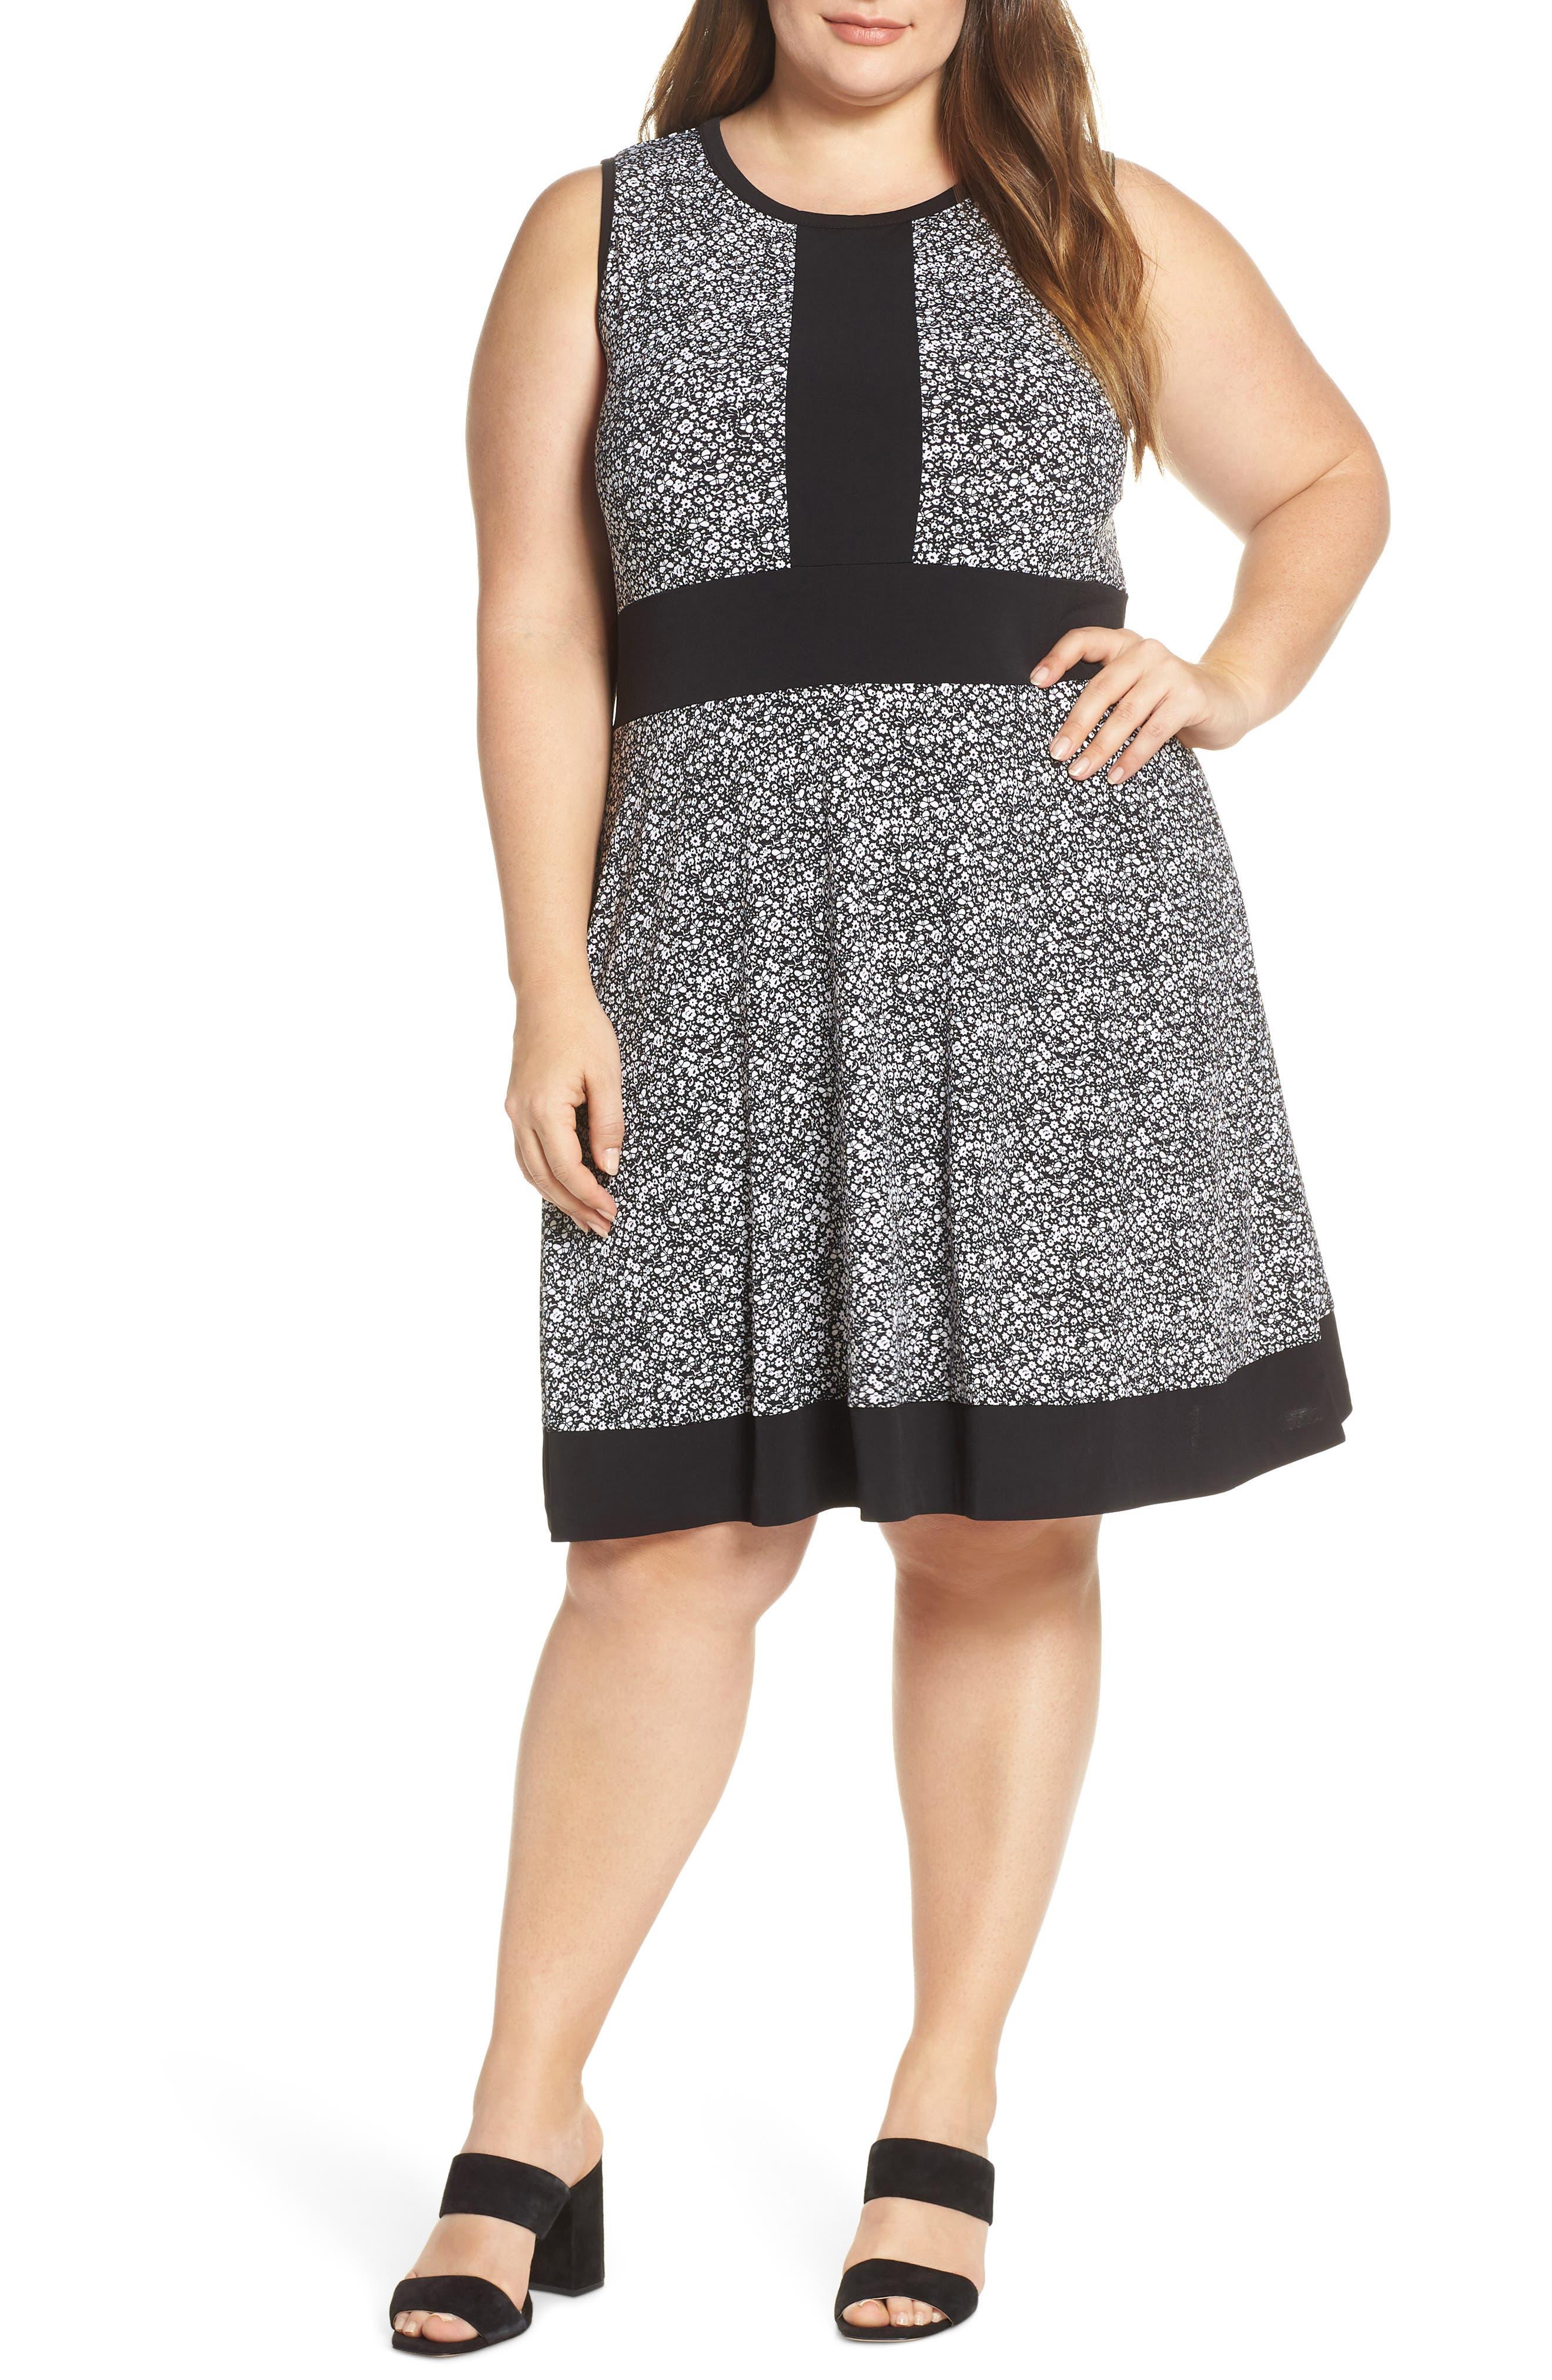 MICHAEL MICHAEL KORS Spring Twist Dress, Main, color, BLACK/ WHITE